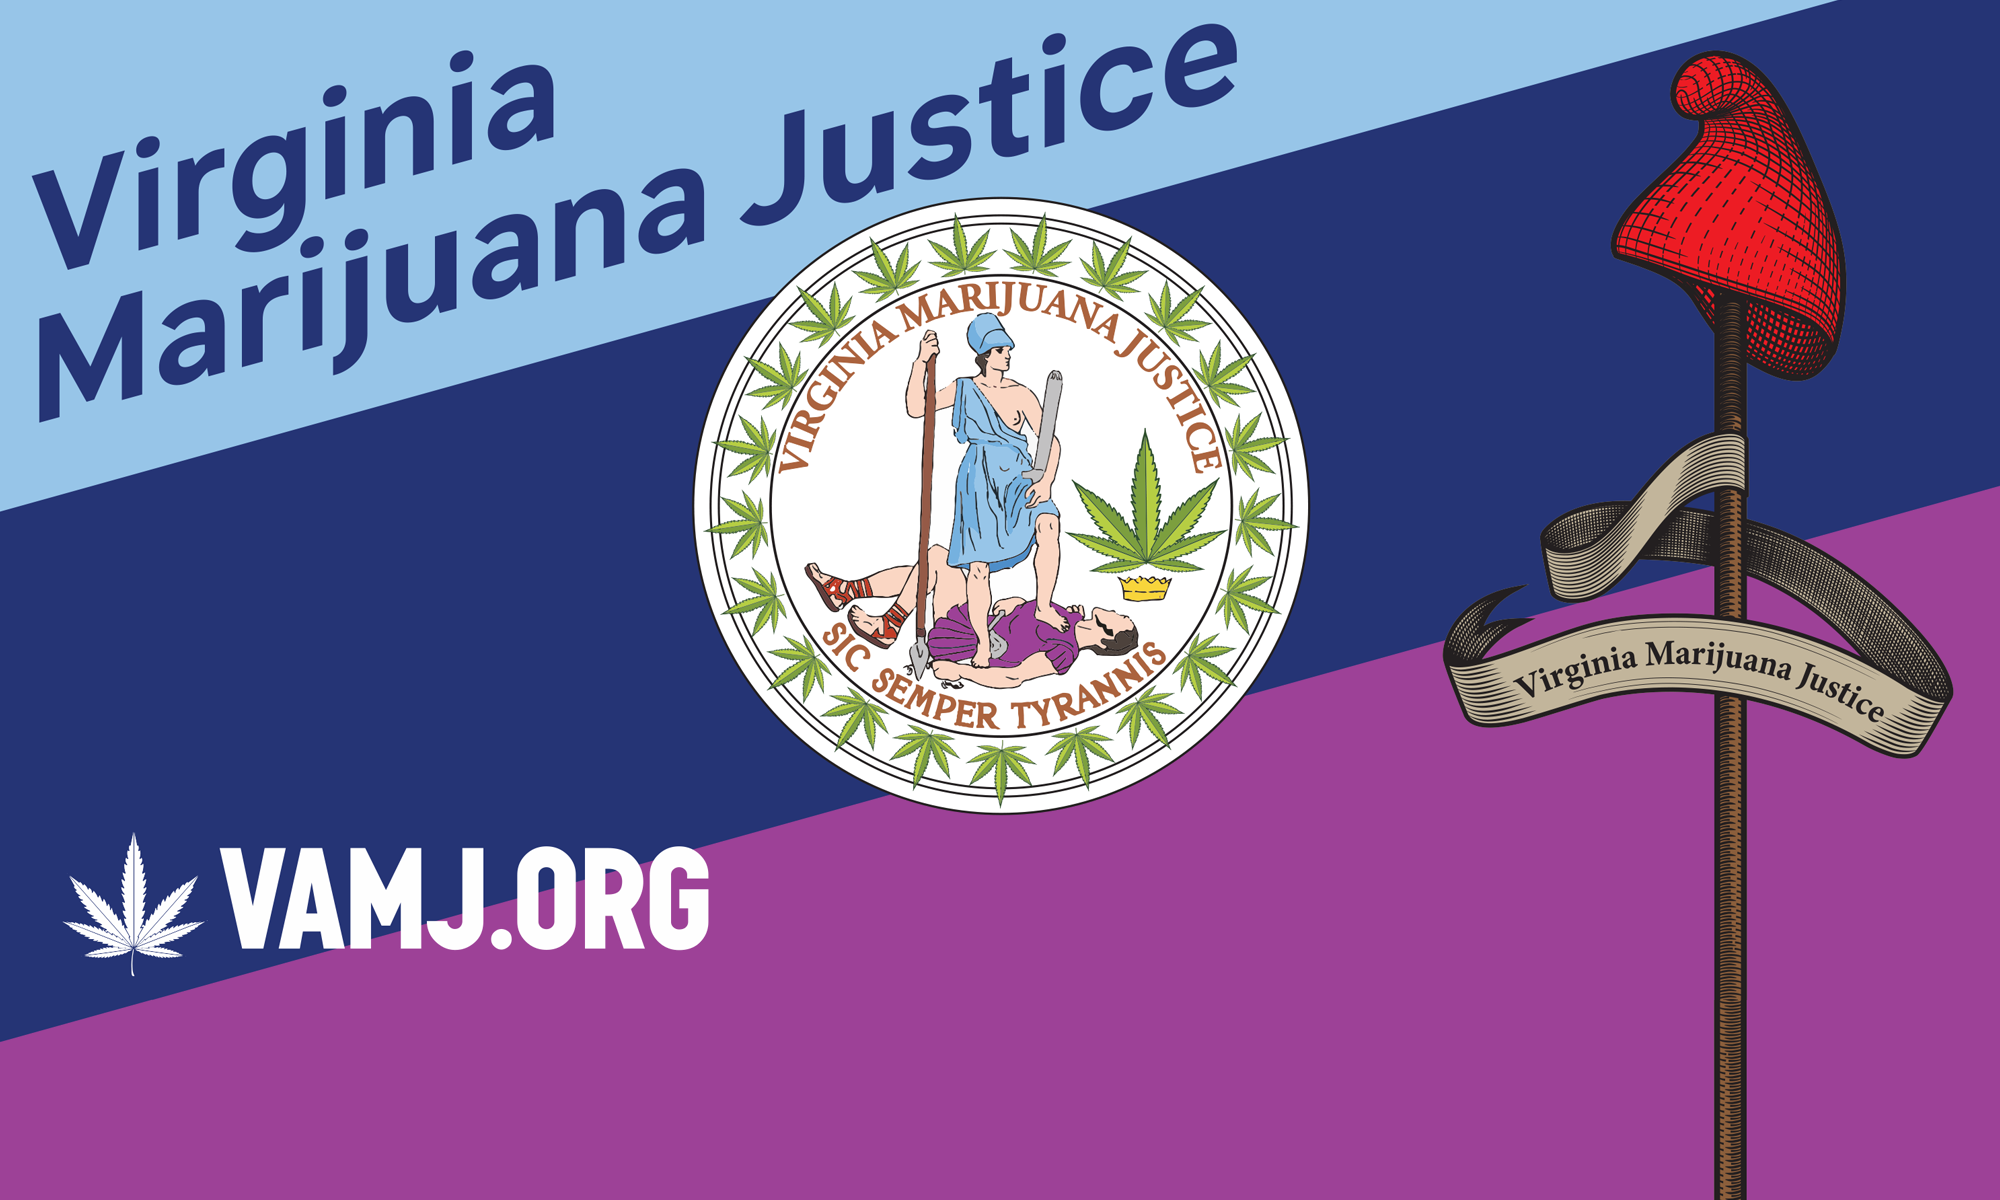 Virginia Marijuana Justice